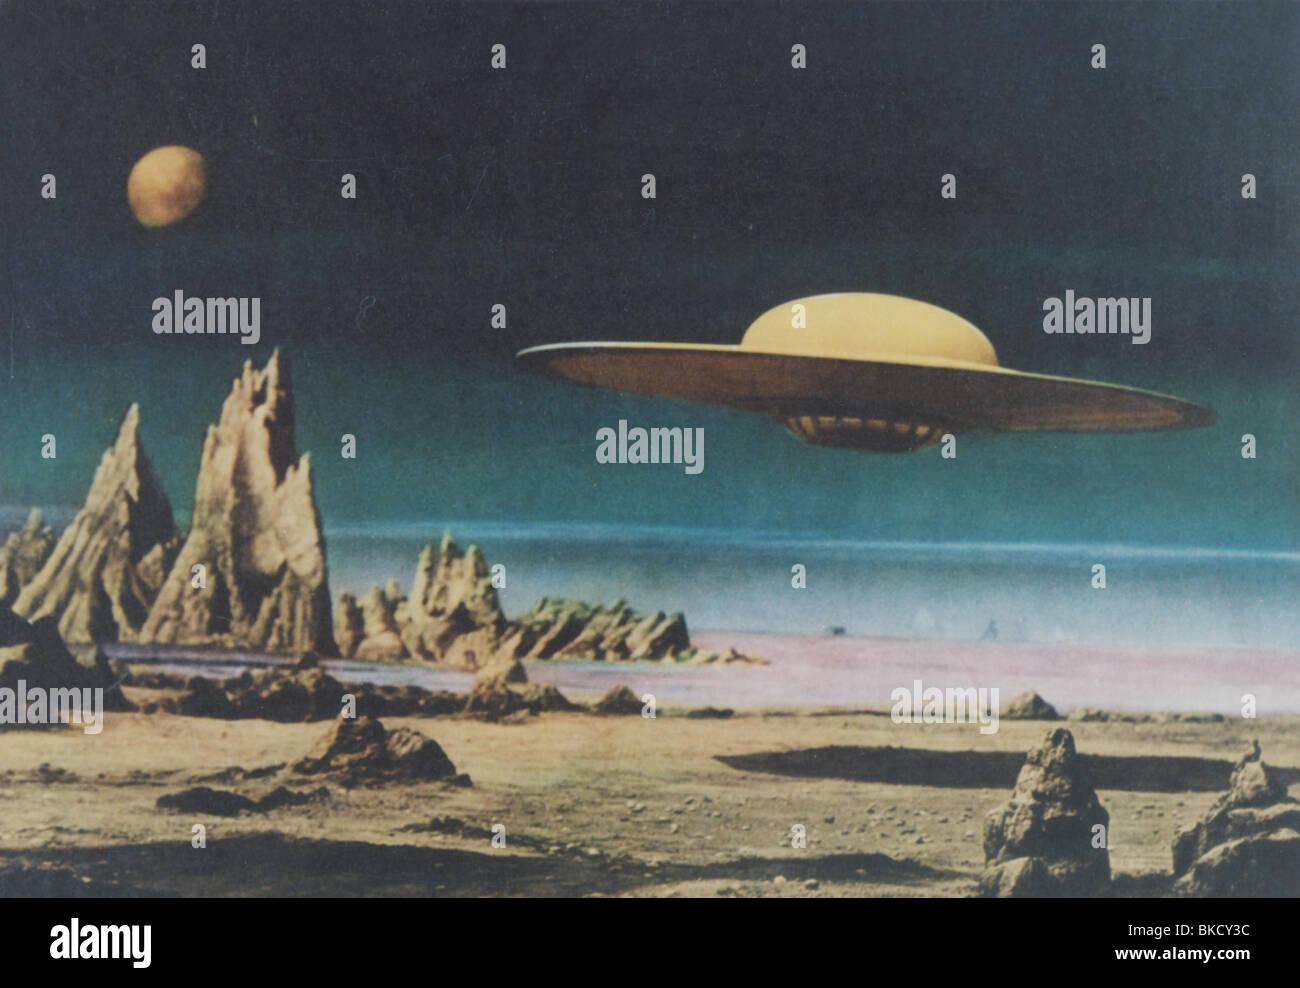 FORBIDDEN PLANET -1956 - Stock Image